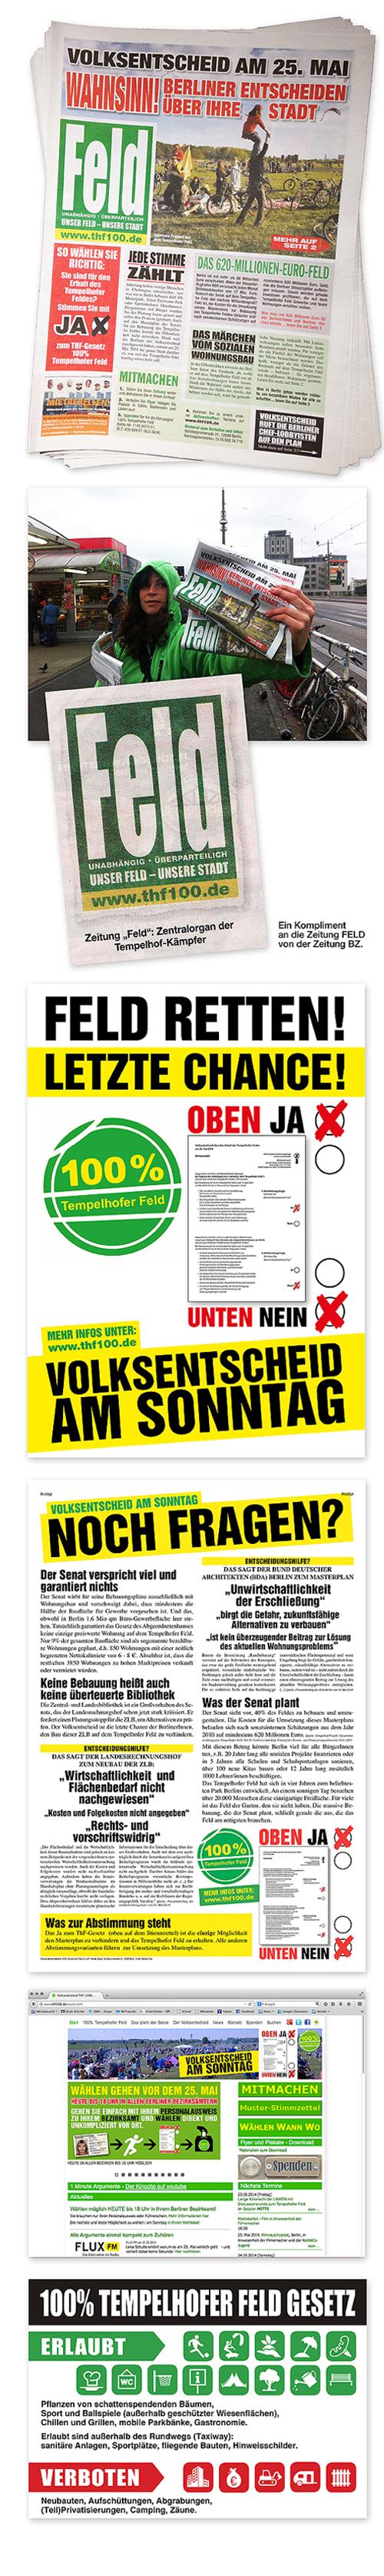 Bürgerinitiative 100% Tempelhofer Feld, Flughafen Tempelhof, BER, Berlinerzeitung, BZ, Tagesspiegel, Masterplan Senat